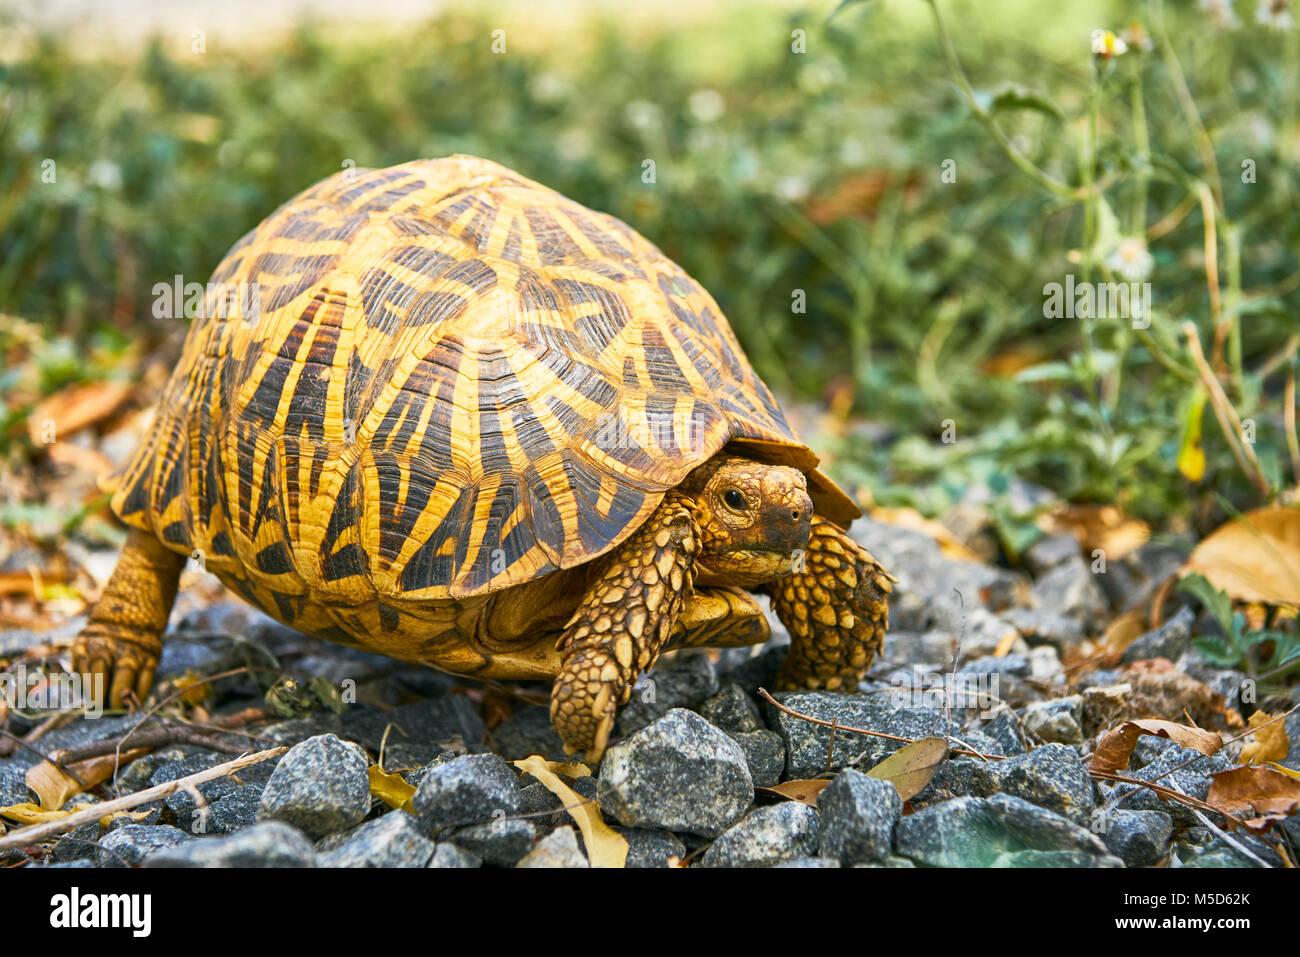 Indian Star Tortoise (Geochelone elegans), Yala National Park, Southern Province, Sri Lanka - Stock Image